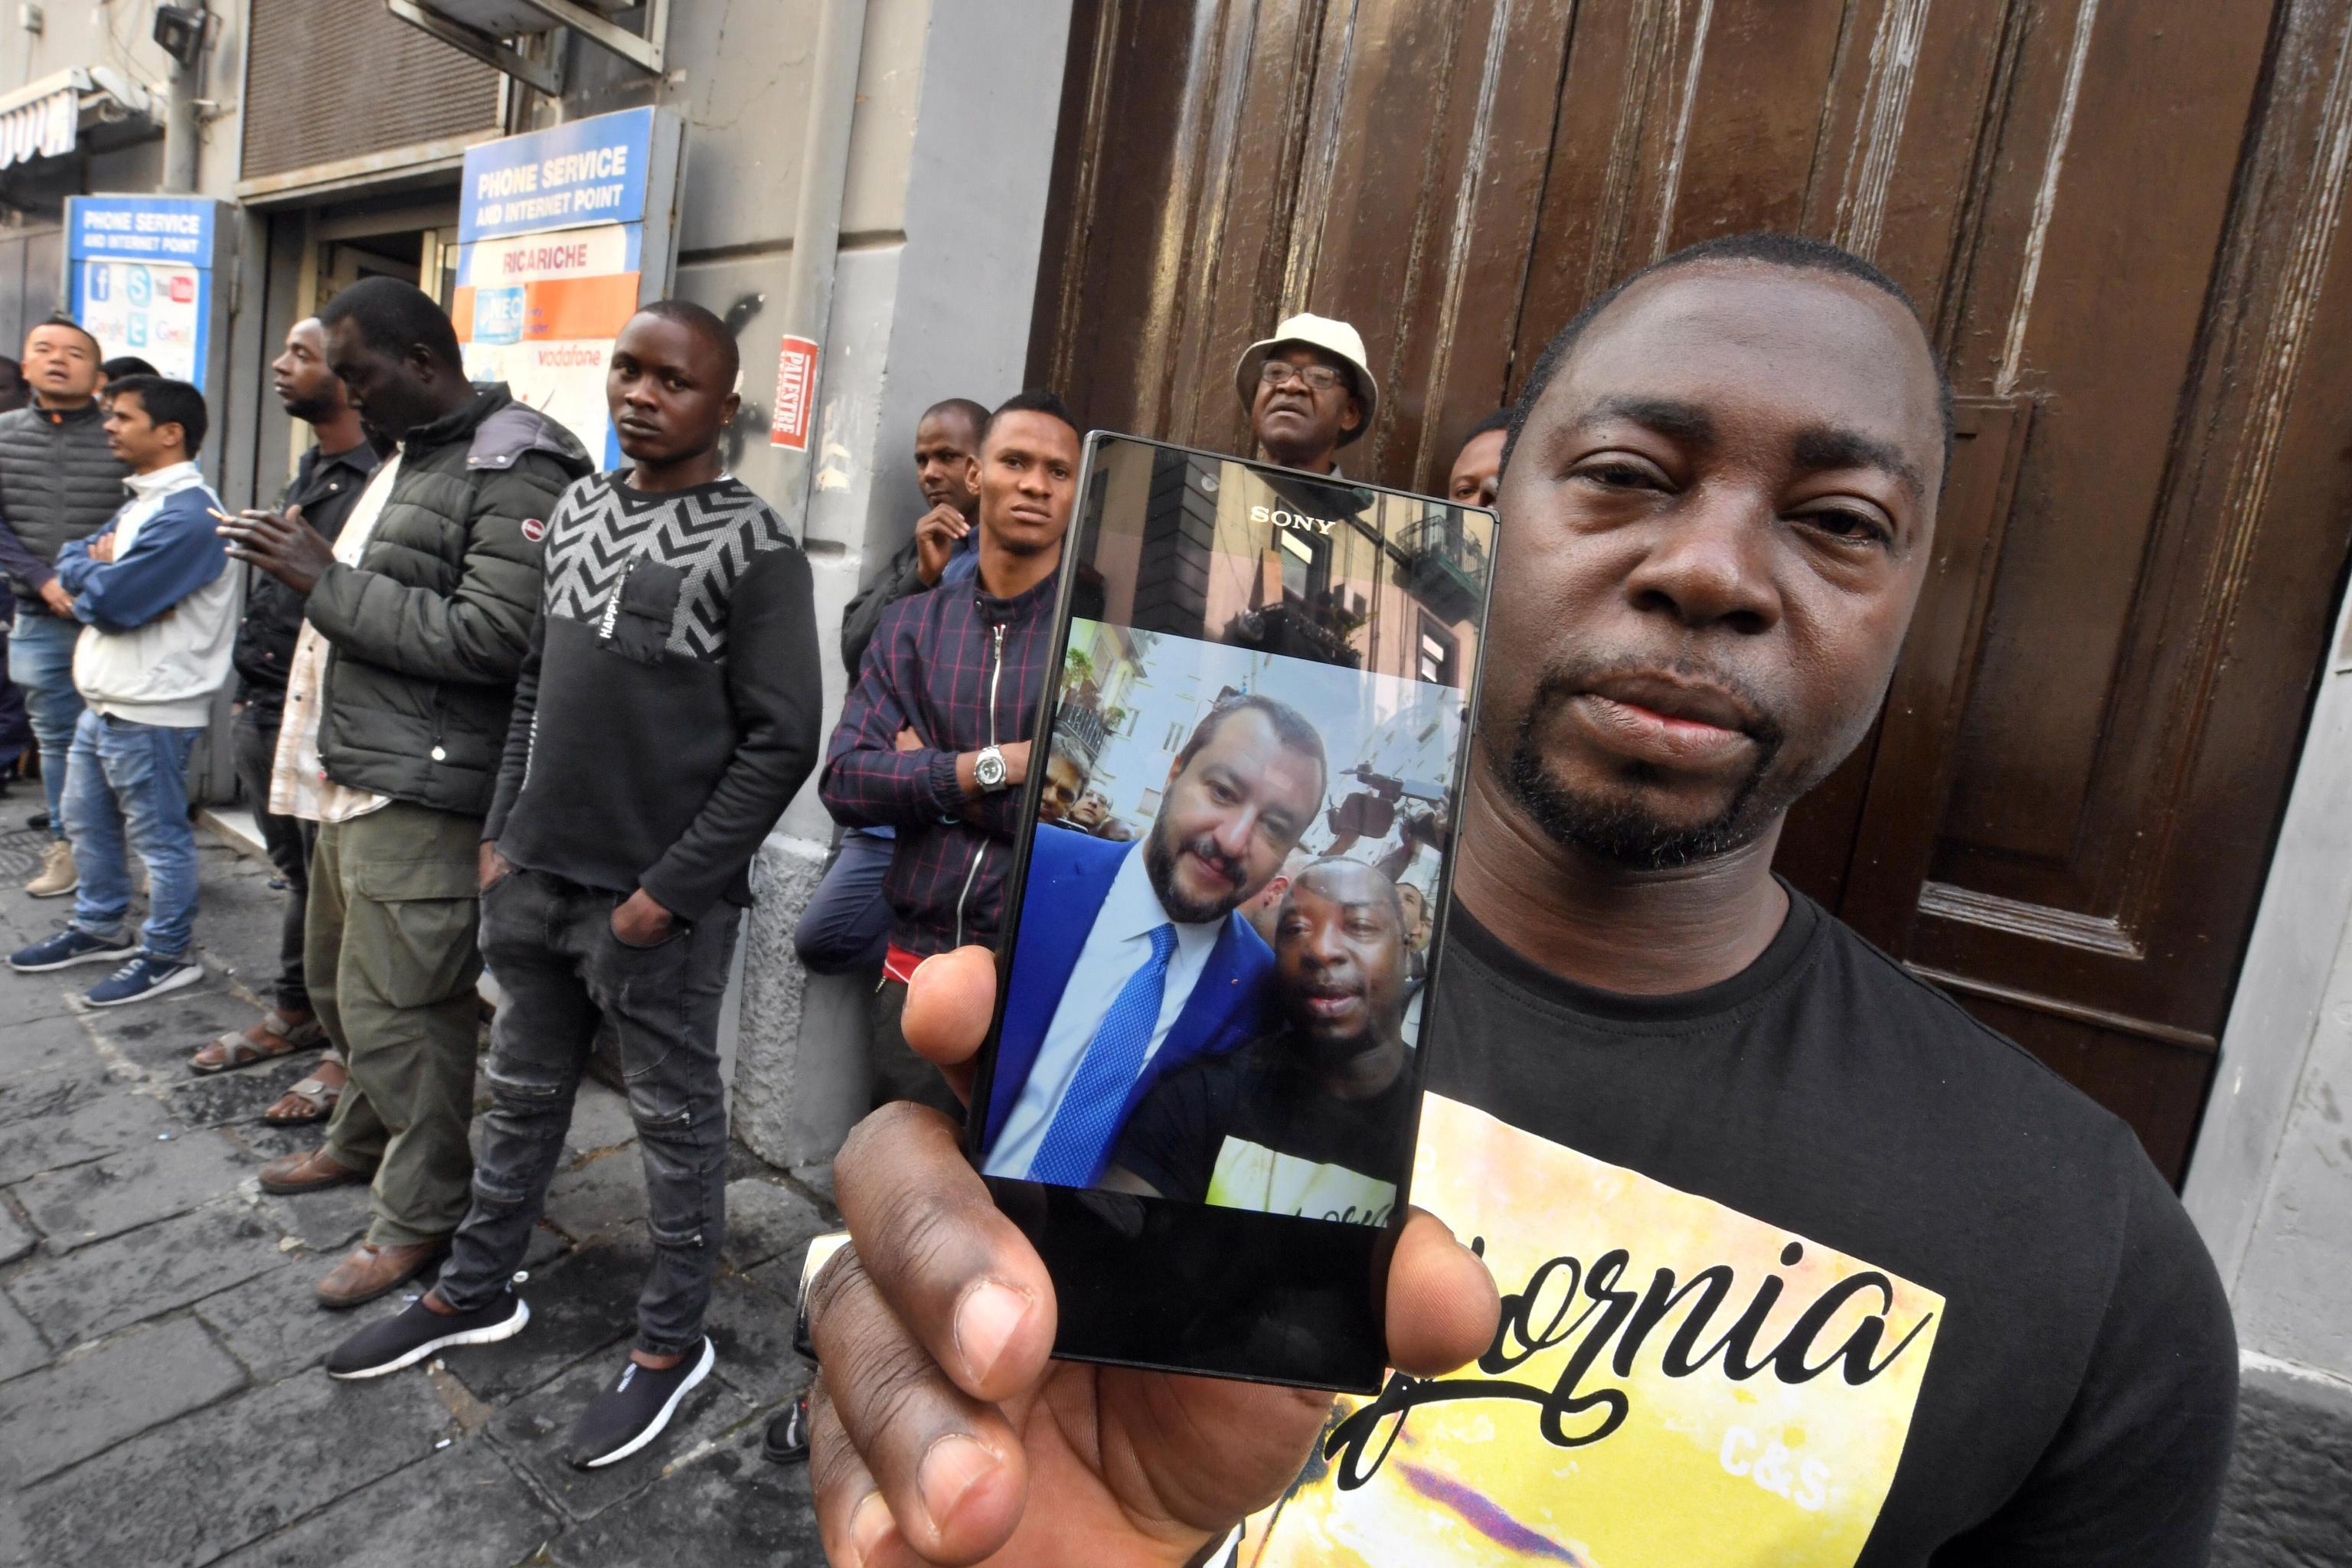 Italija zatvara zračne luke za neovlaštene letove s migrantima